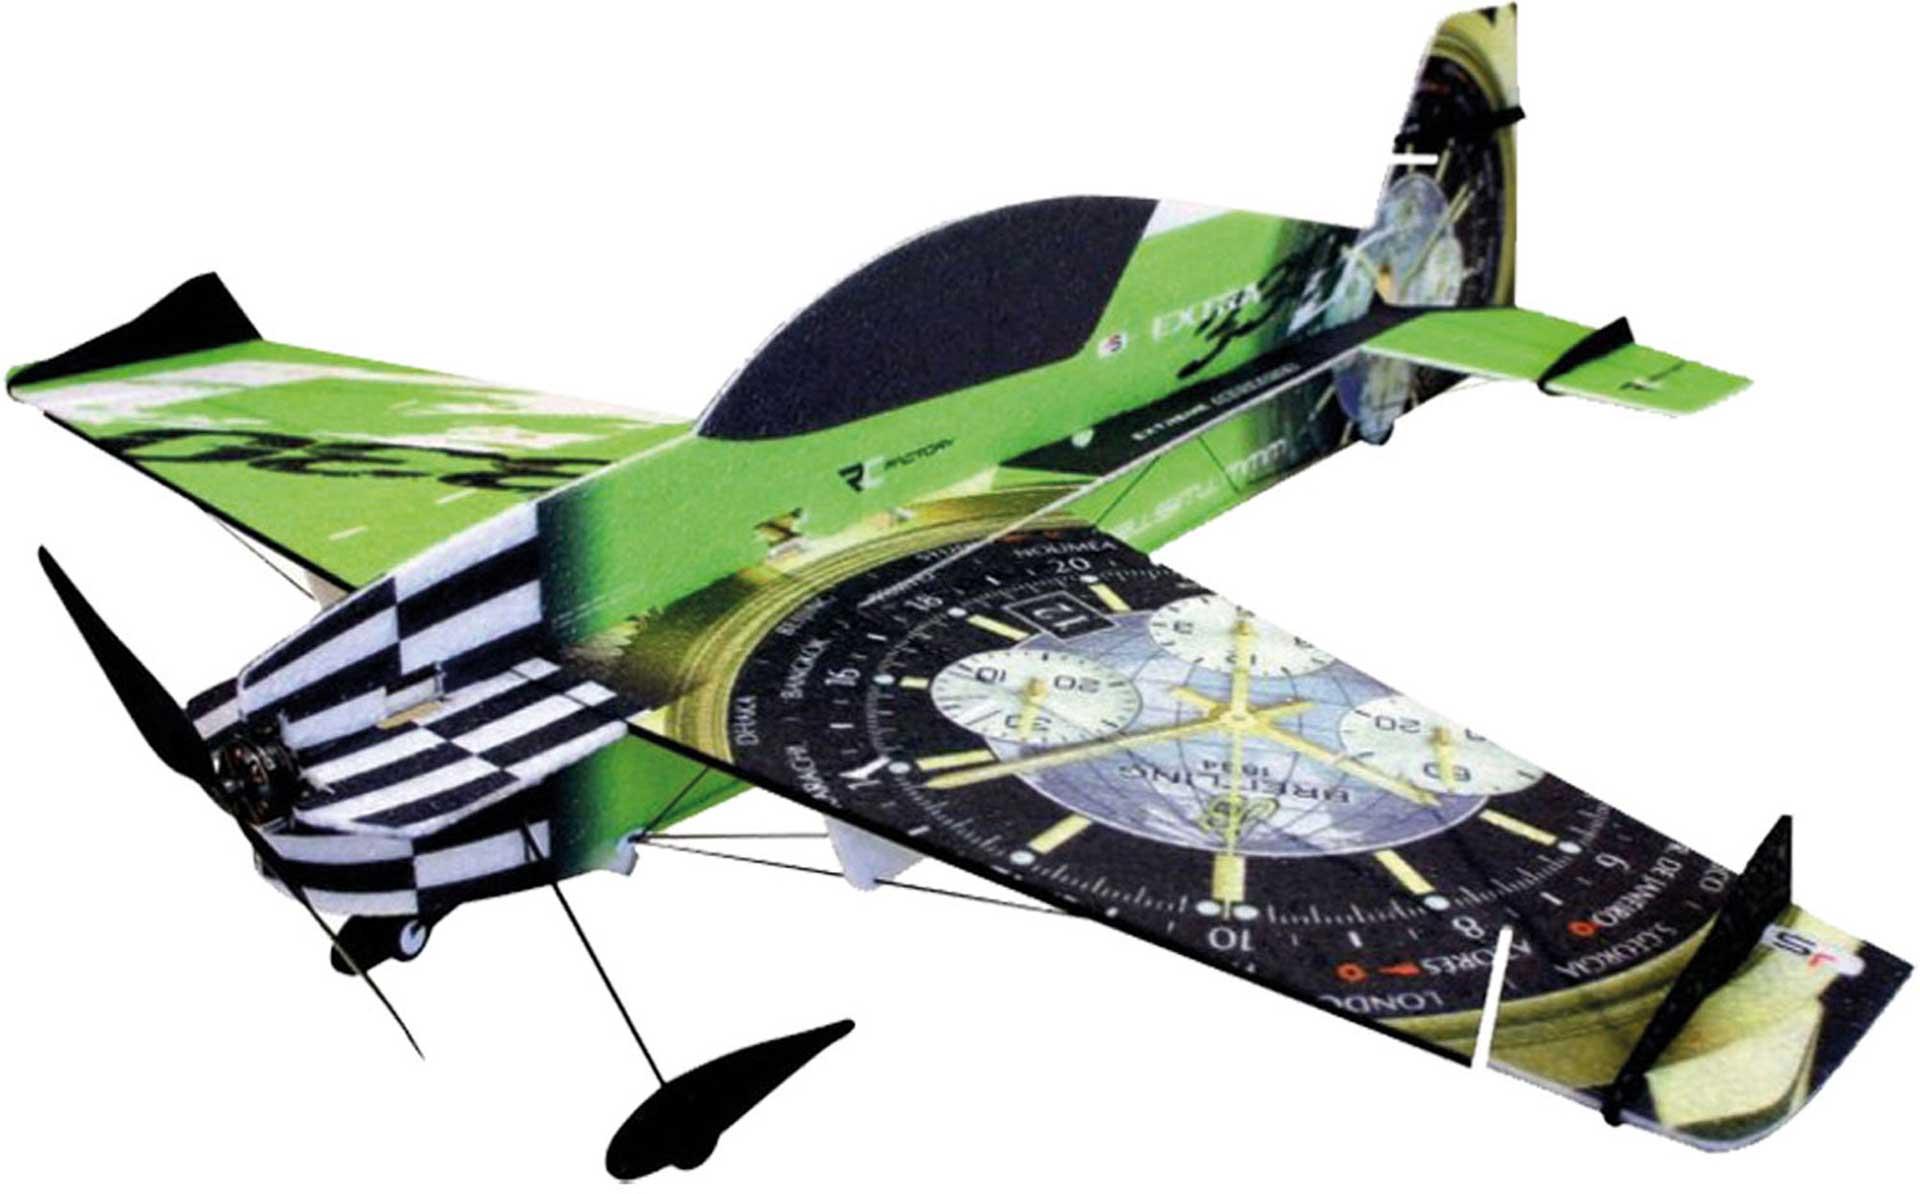 PICHLER EXTRA SUPERLITE GREEN COMBO 3D